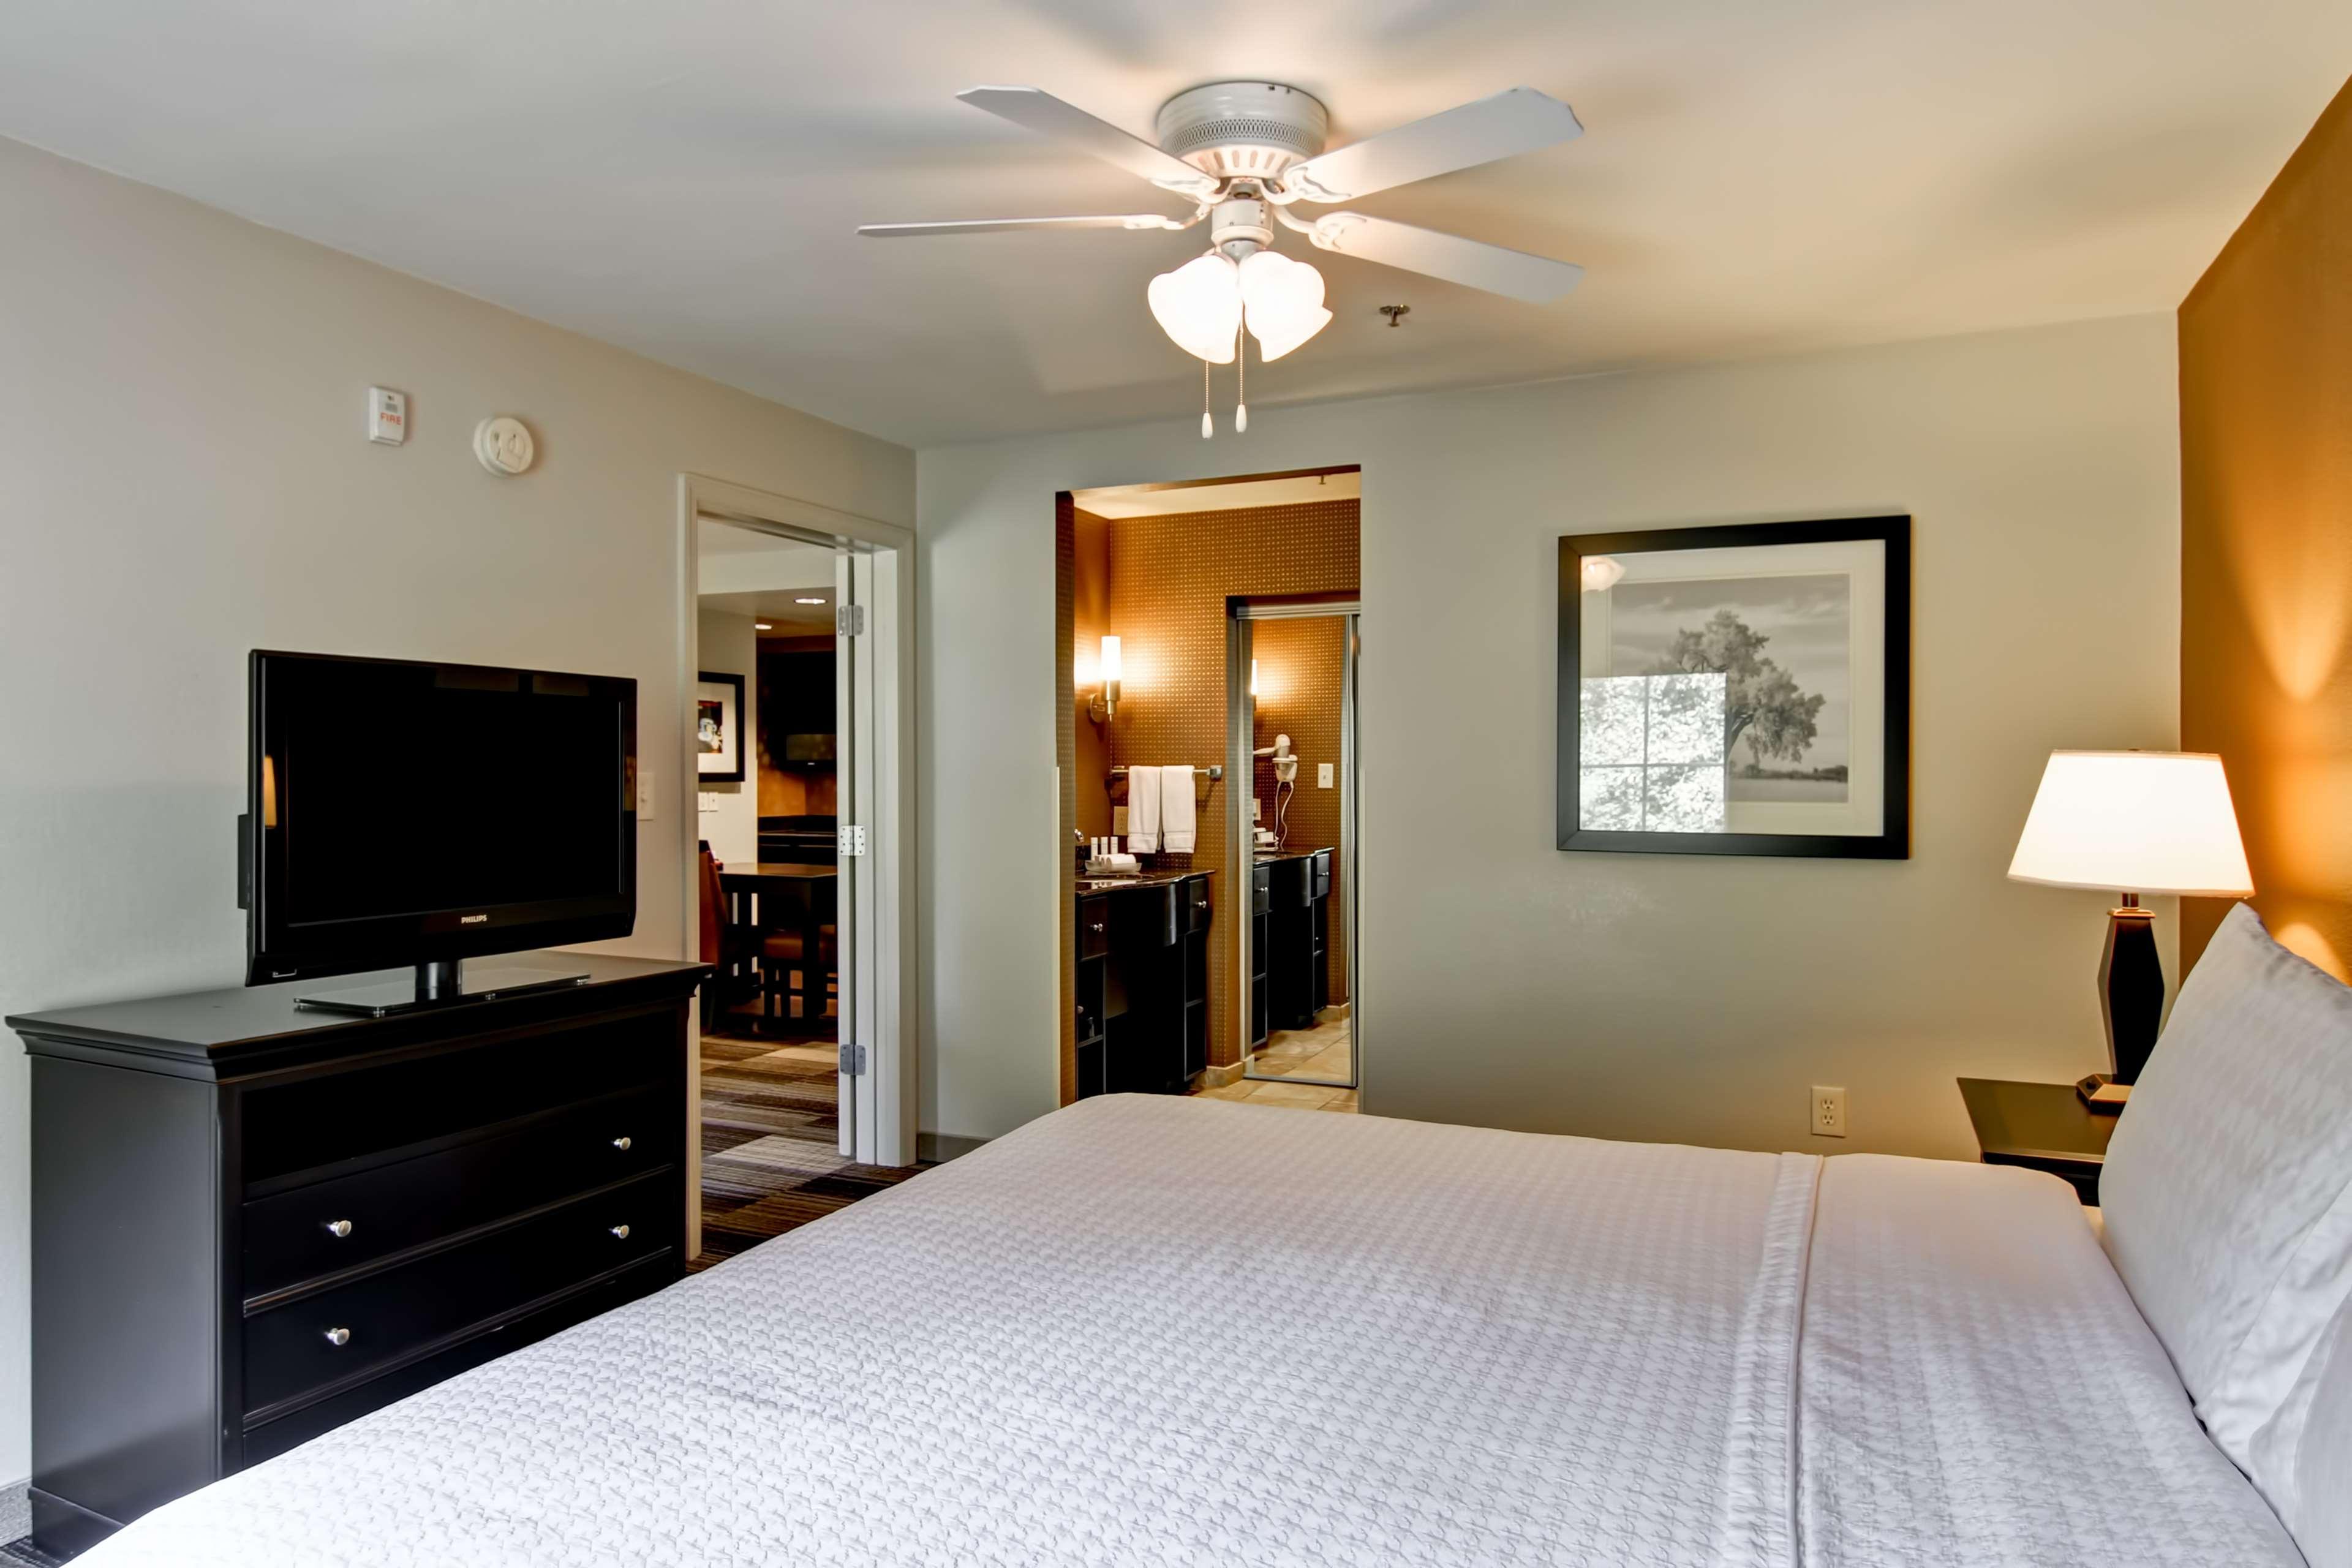 Homewood Suites by Hilton Cincinnati Airport South-Florence image 28